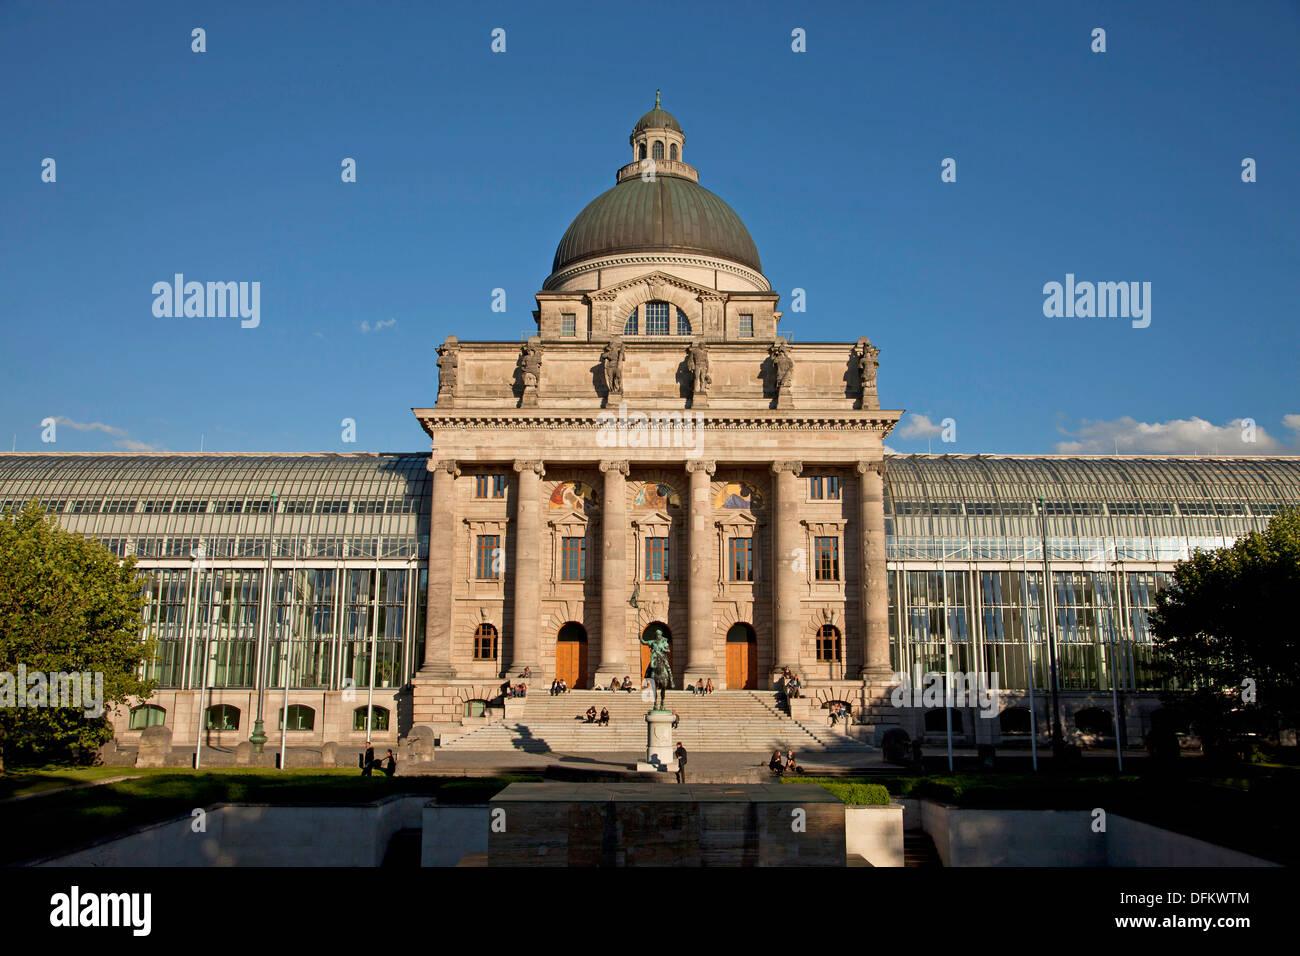 The Bayerische Staatskanzlei, Bavarian State Chancellery in Munich, Bavaria, Germany - Stock Image